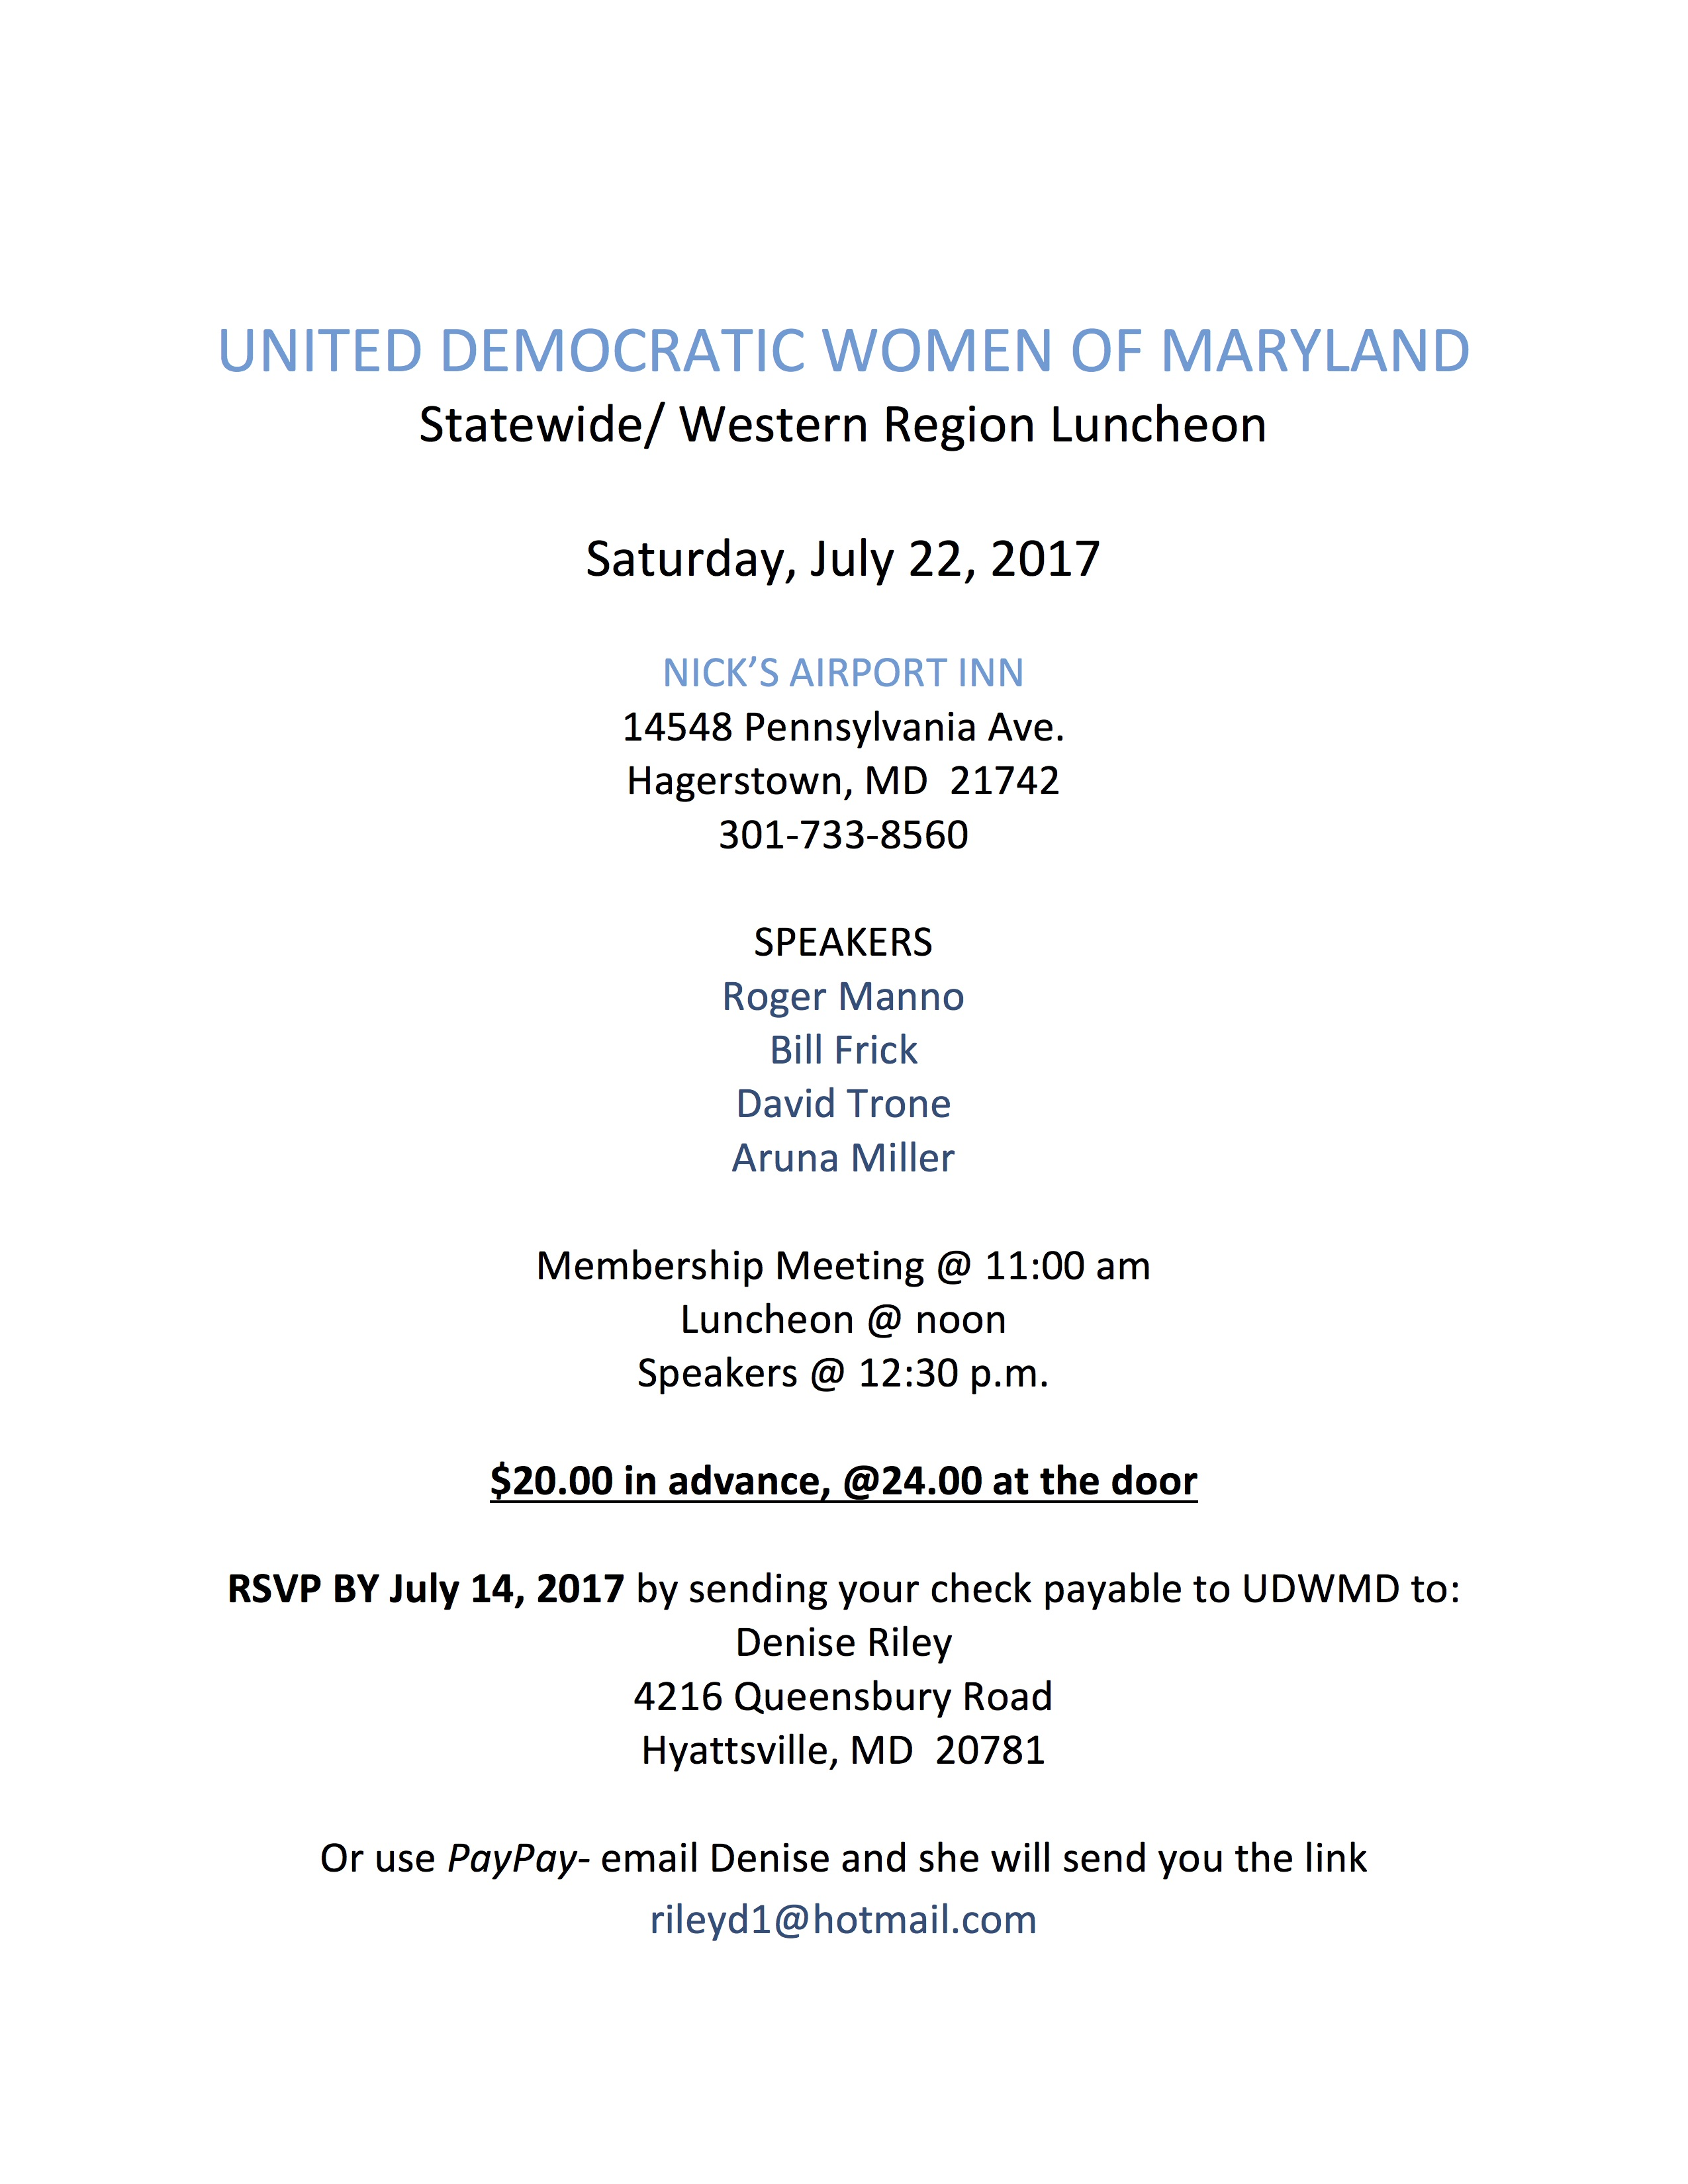 Statewide_July_22__2017.jpg